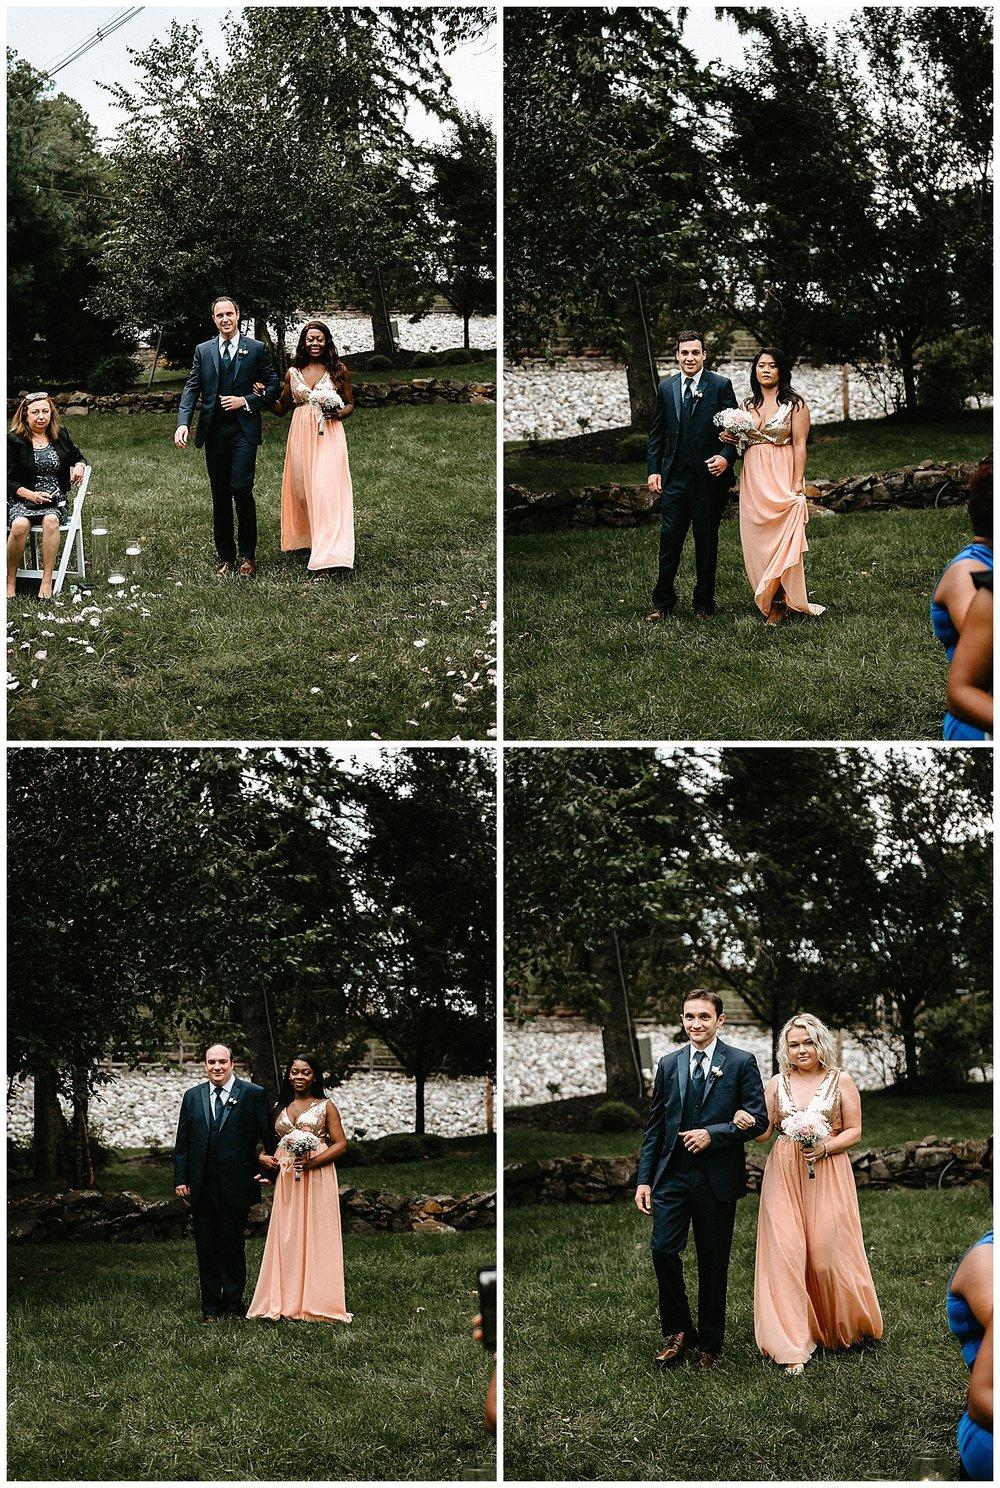 New-Jersey-wedding-photographer-at-Stone-House-at-stirling-ridge-Warren-NJ_0040.jpg